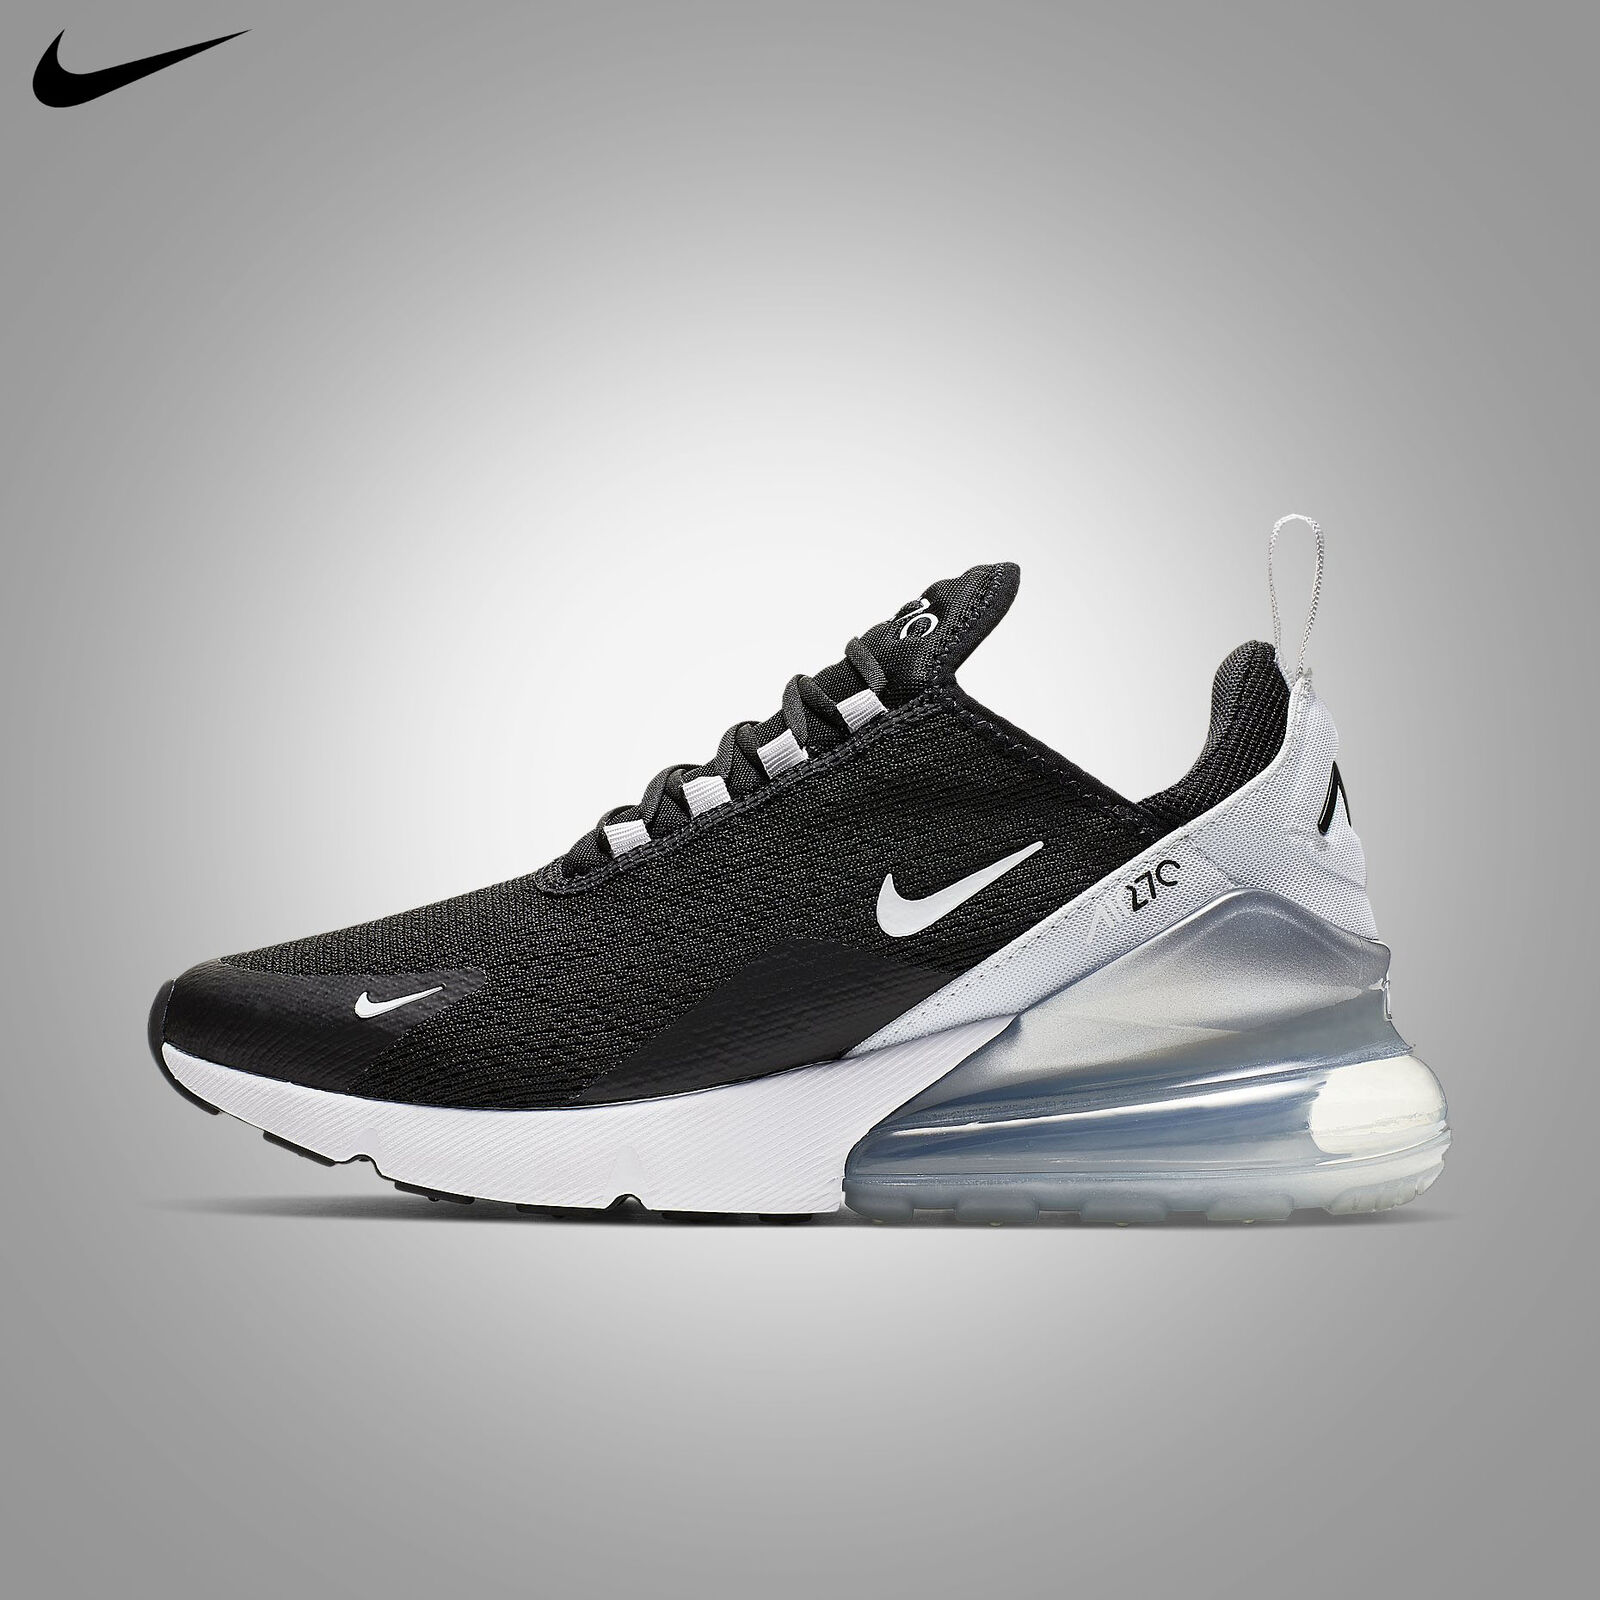 Nike Women's Air Max 270 Black Pure Platinum White 2019 Running Gym AH6789 013